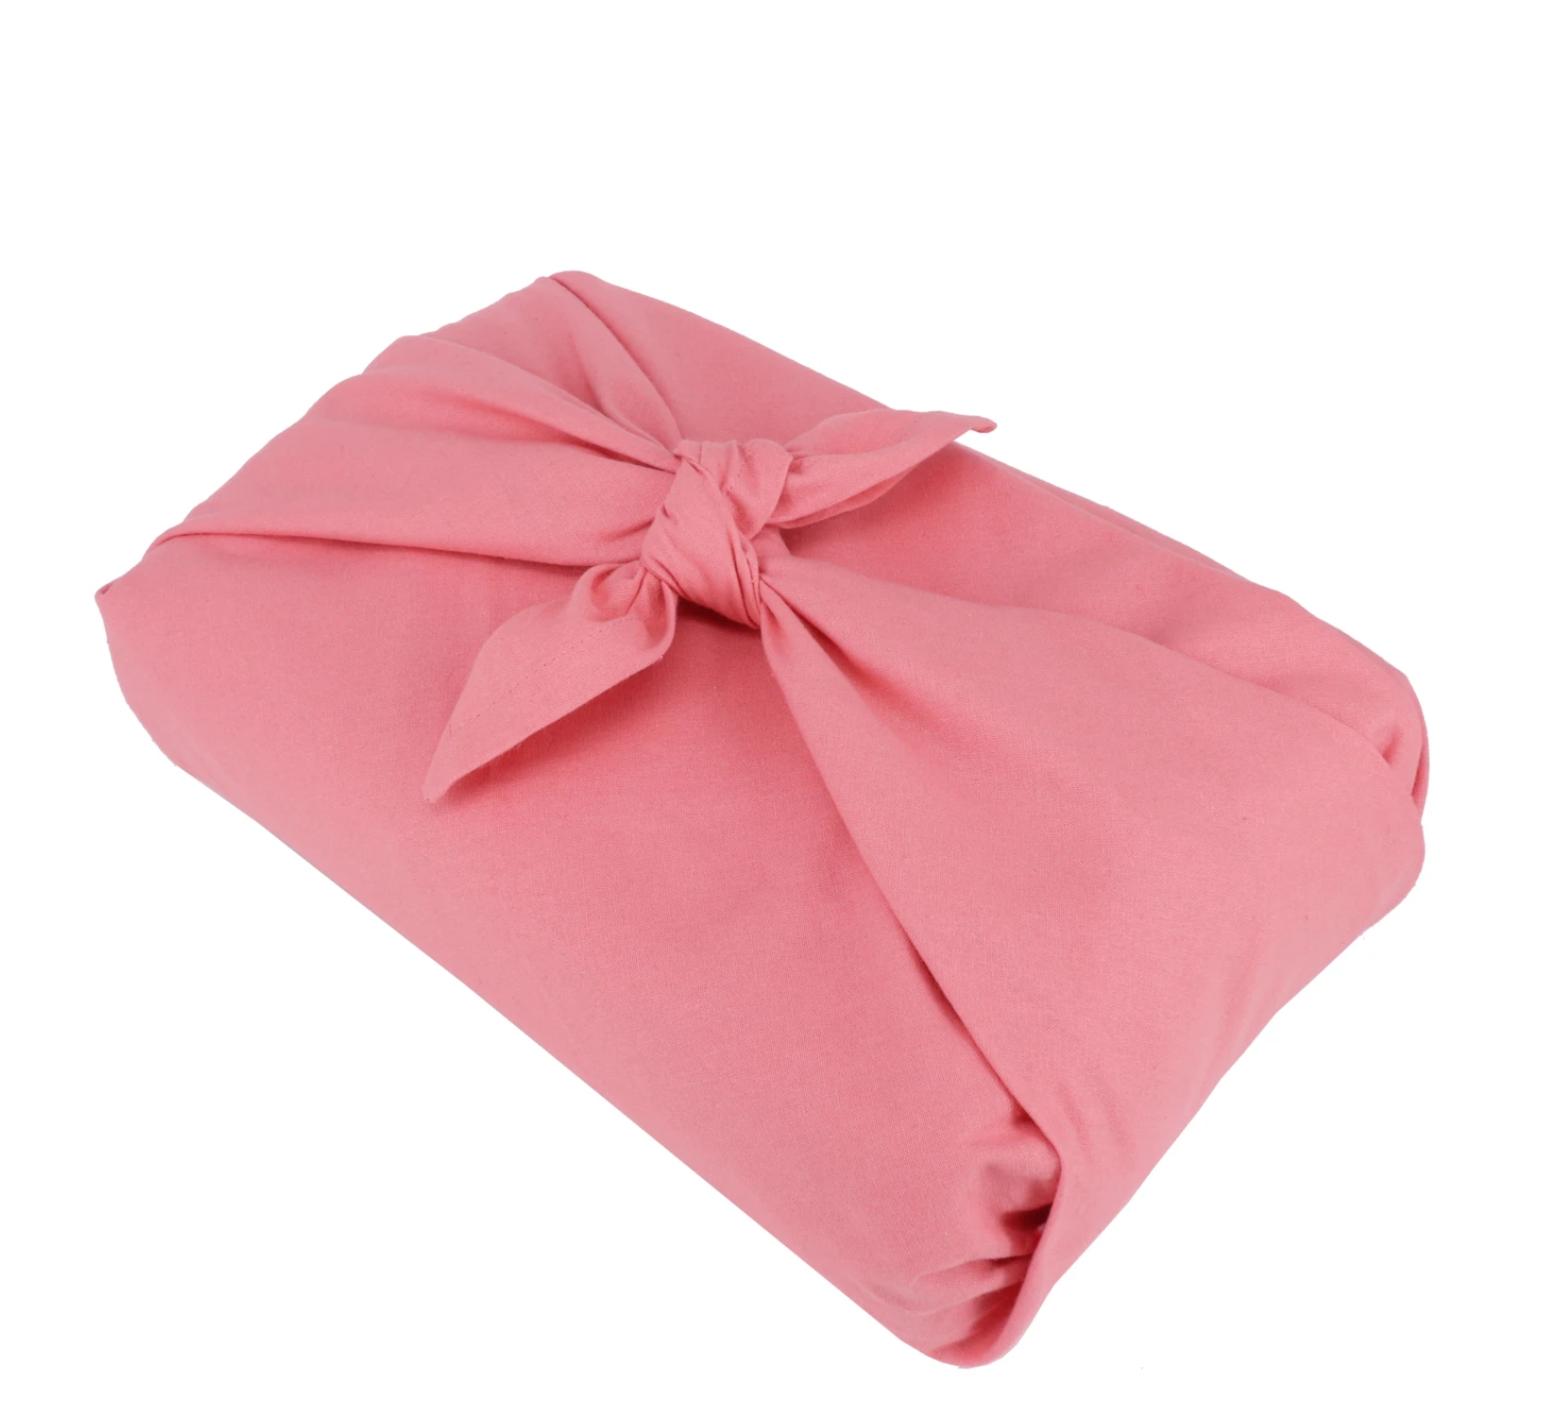 Geschenkverpakking Set - Zachte Kleuren - The Organic Company-3